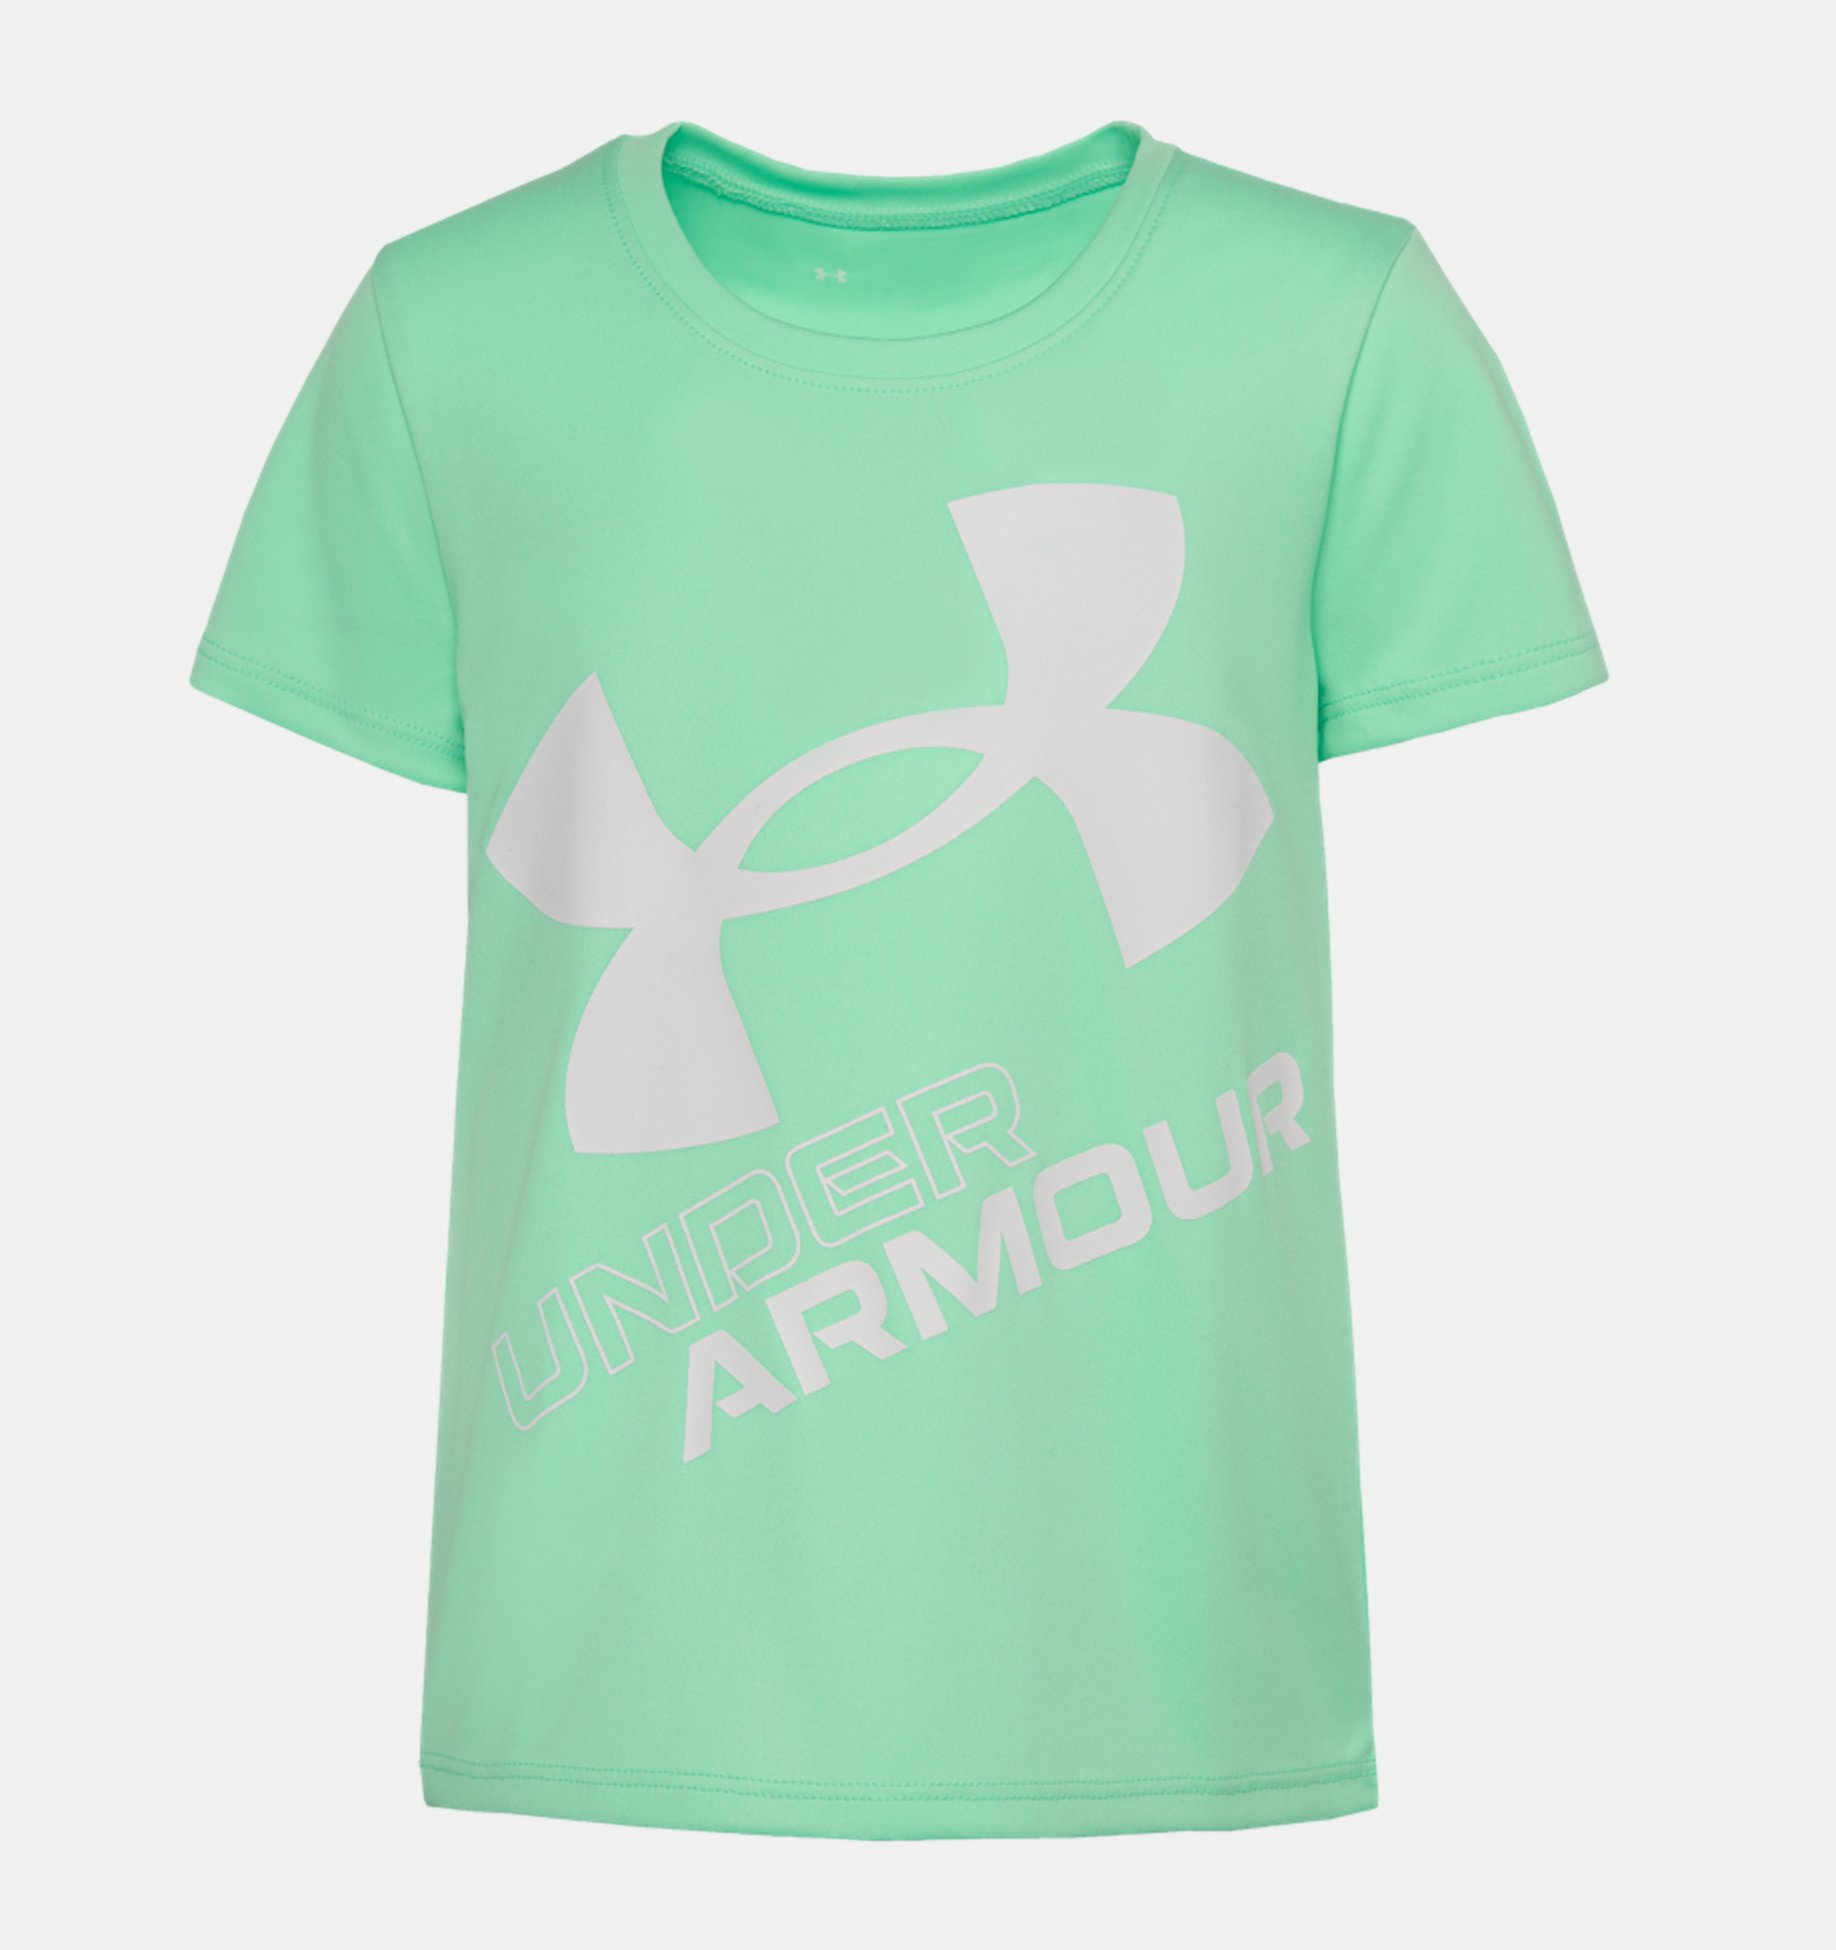 Underarmour Girls Toddler UA Jumbo Logo Short Sleeve